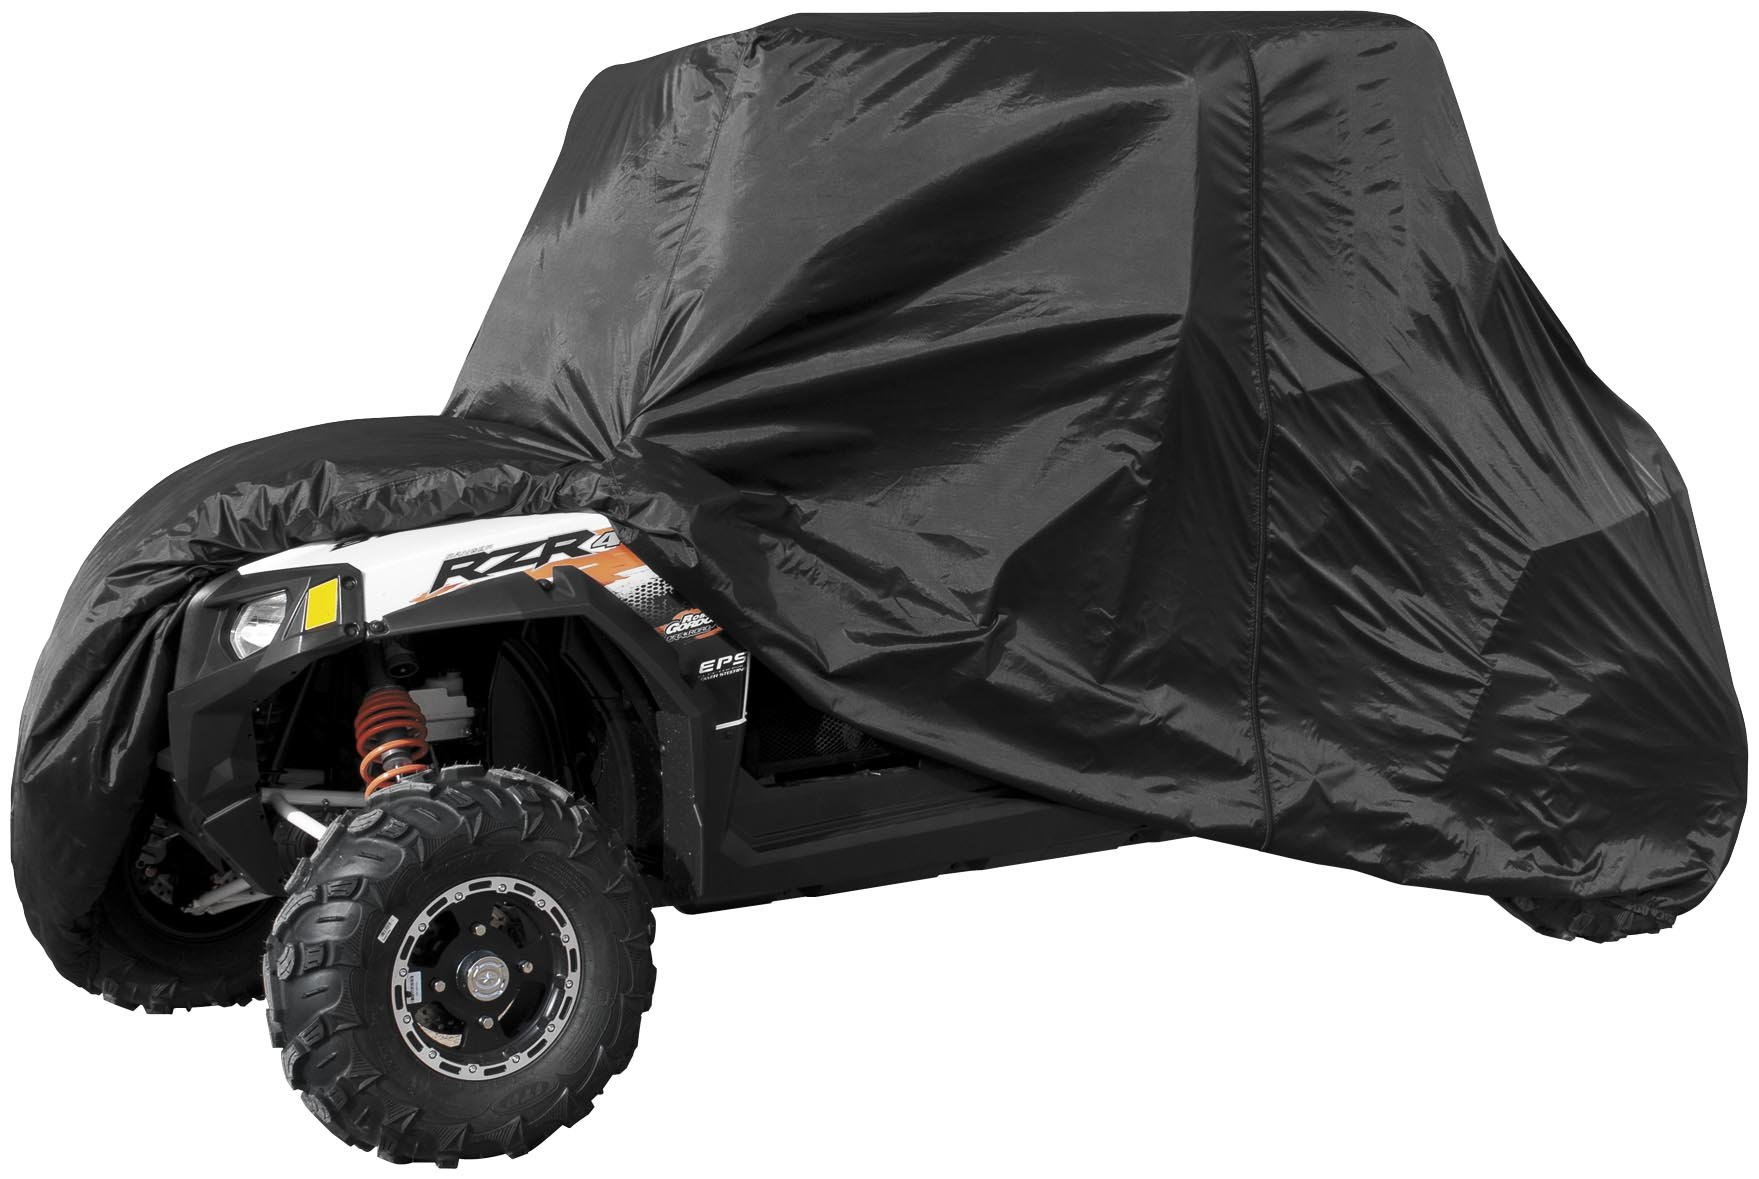 QuadBoss UTV 4-Seater Cover - Black